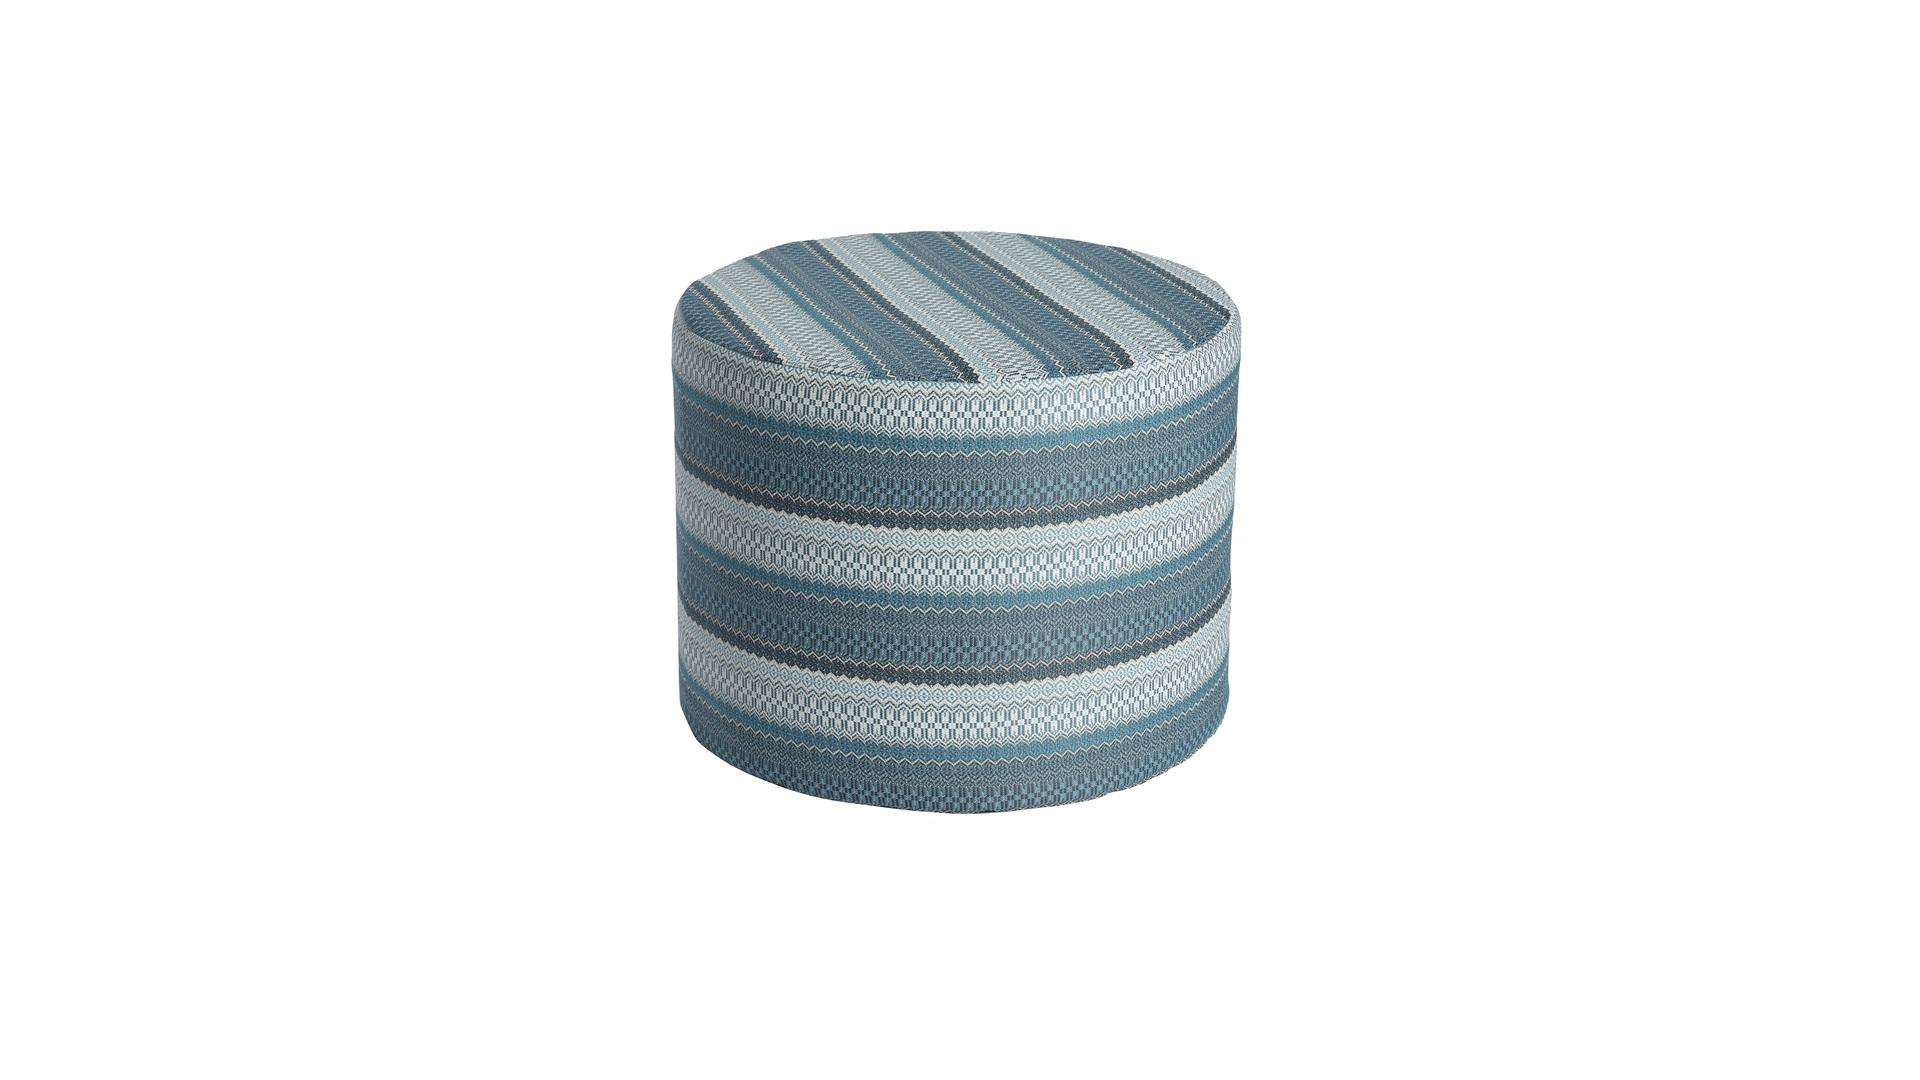 2020 Borek outdoor fabric Desio pouffe Ø60 azzuro 5540 2.jpg